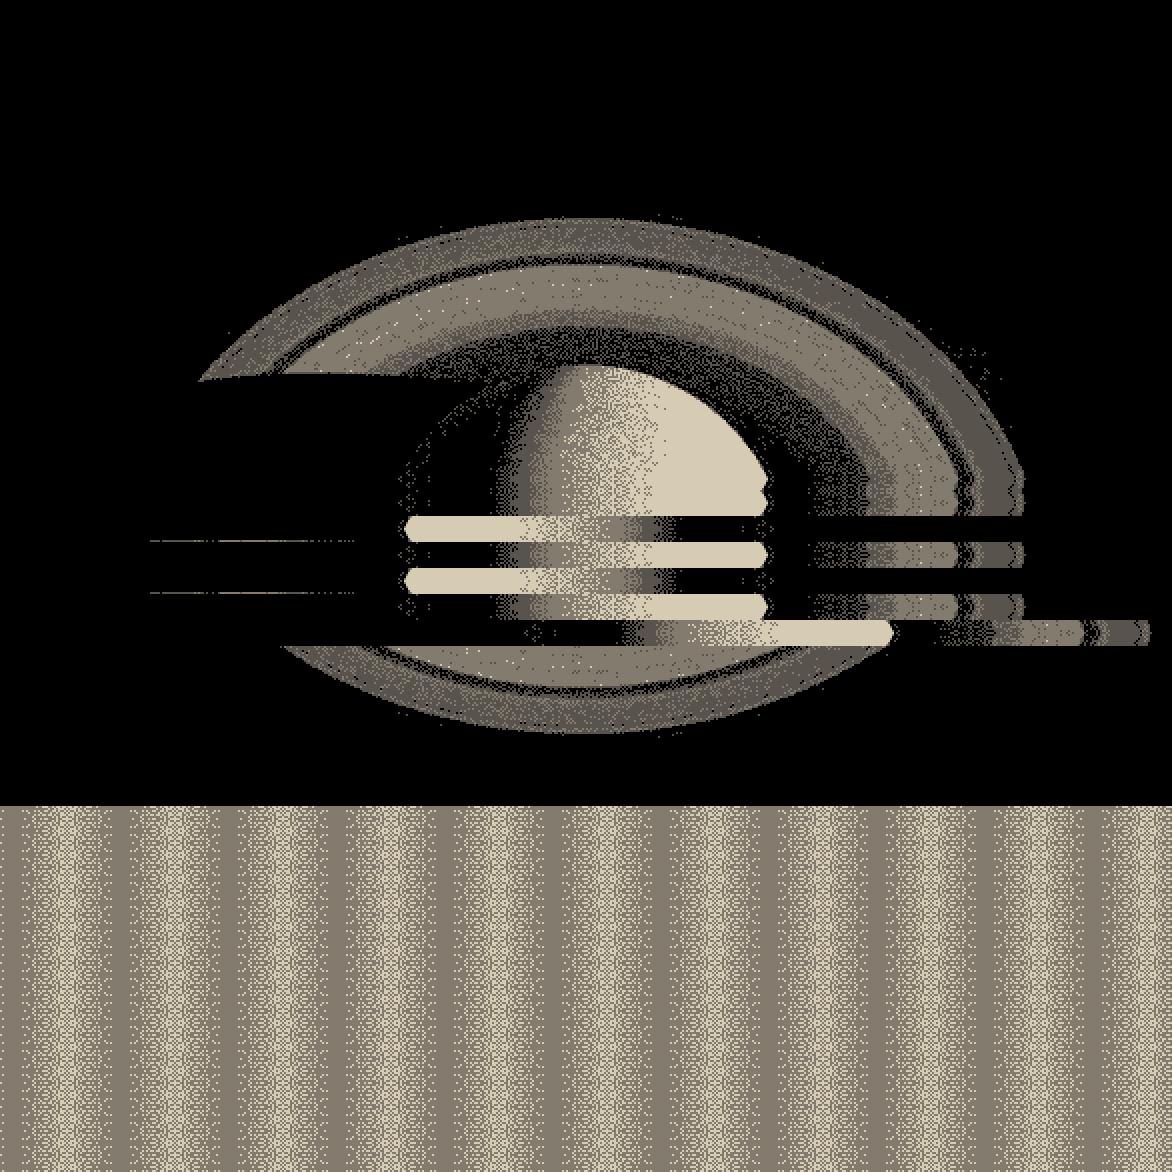 A-Borisov_Saturn_CG_1172x1172_01.png